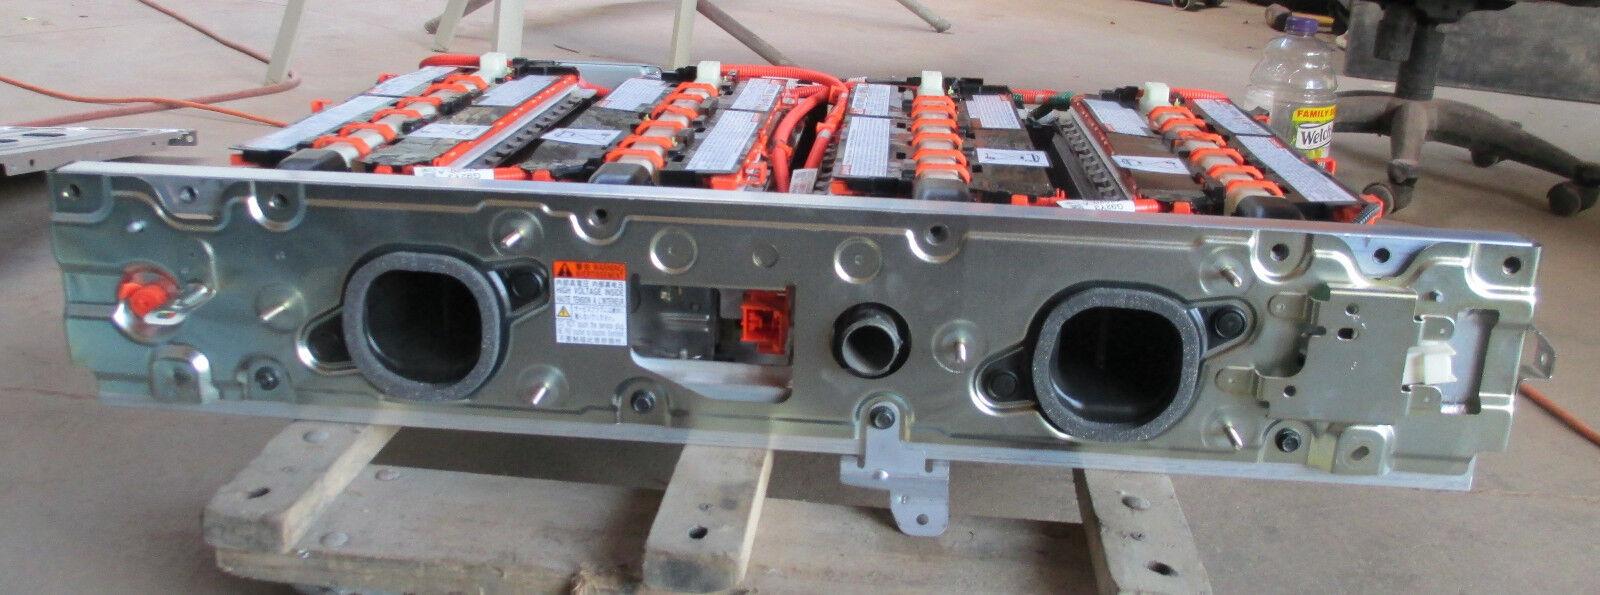 2017 Toyota Prius Plugin Plug In Battery Hybrid Hv G9280 47130 Oem Tested Great For Online Ebay